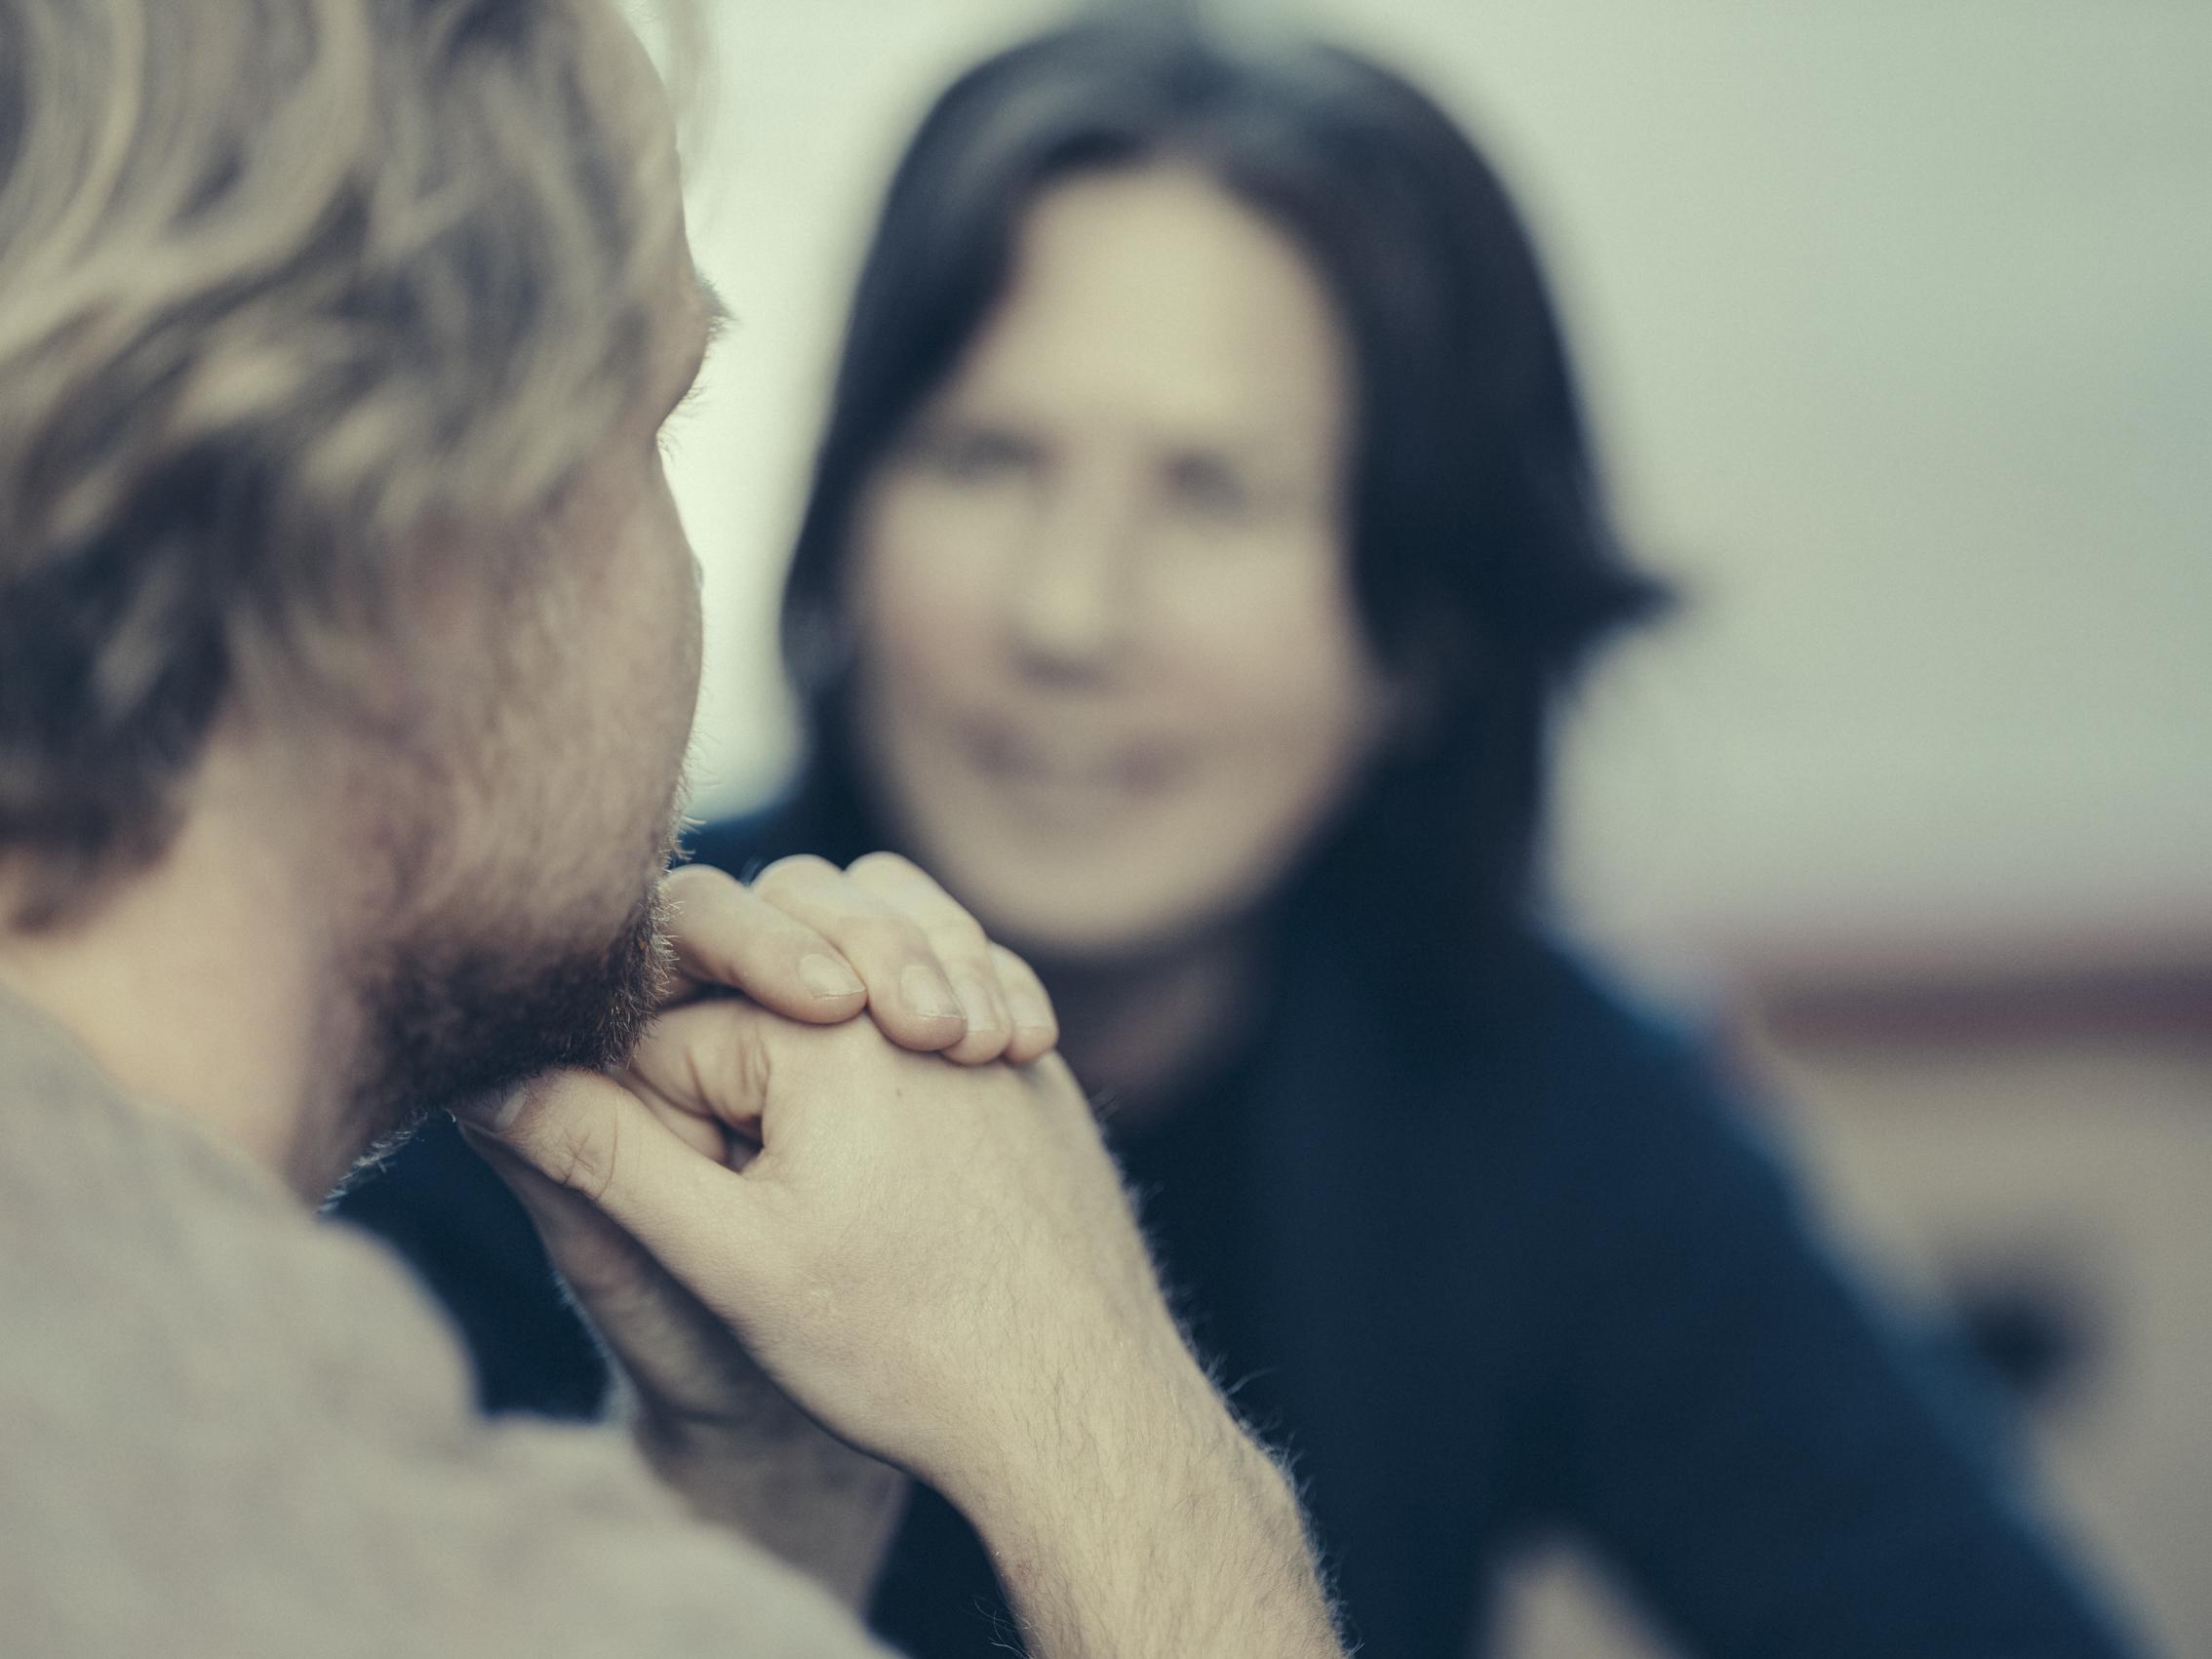 Psykososiale beredskapsteam